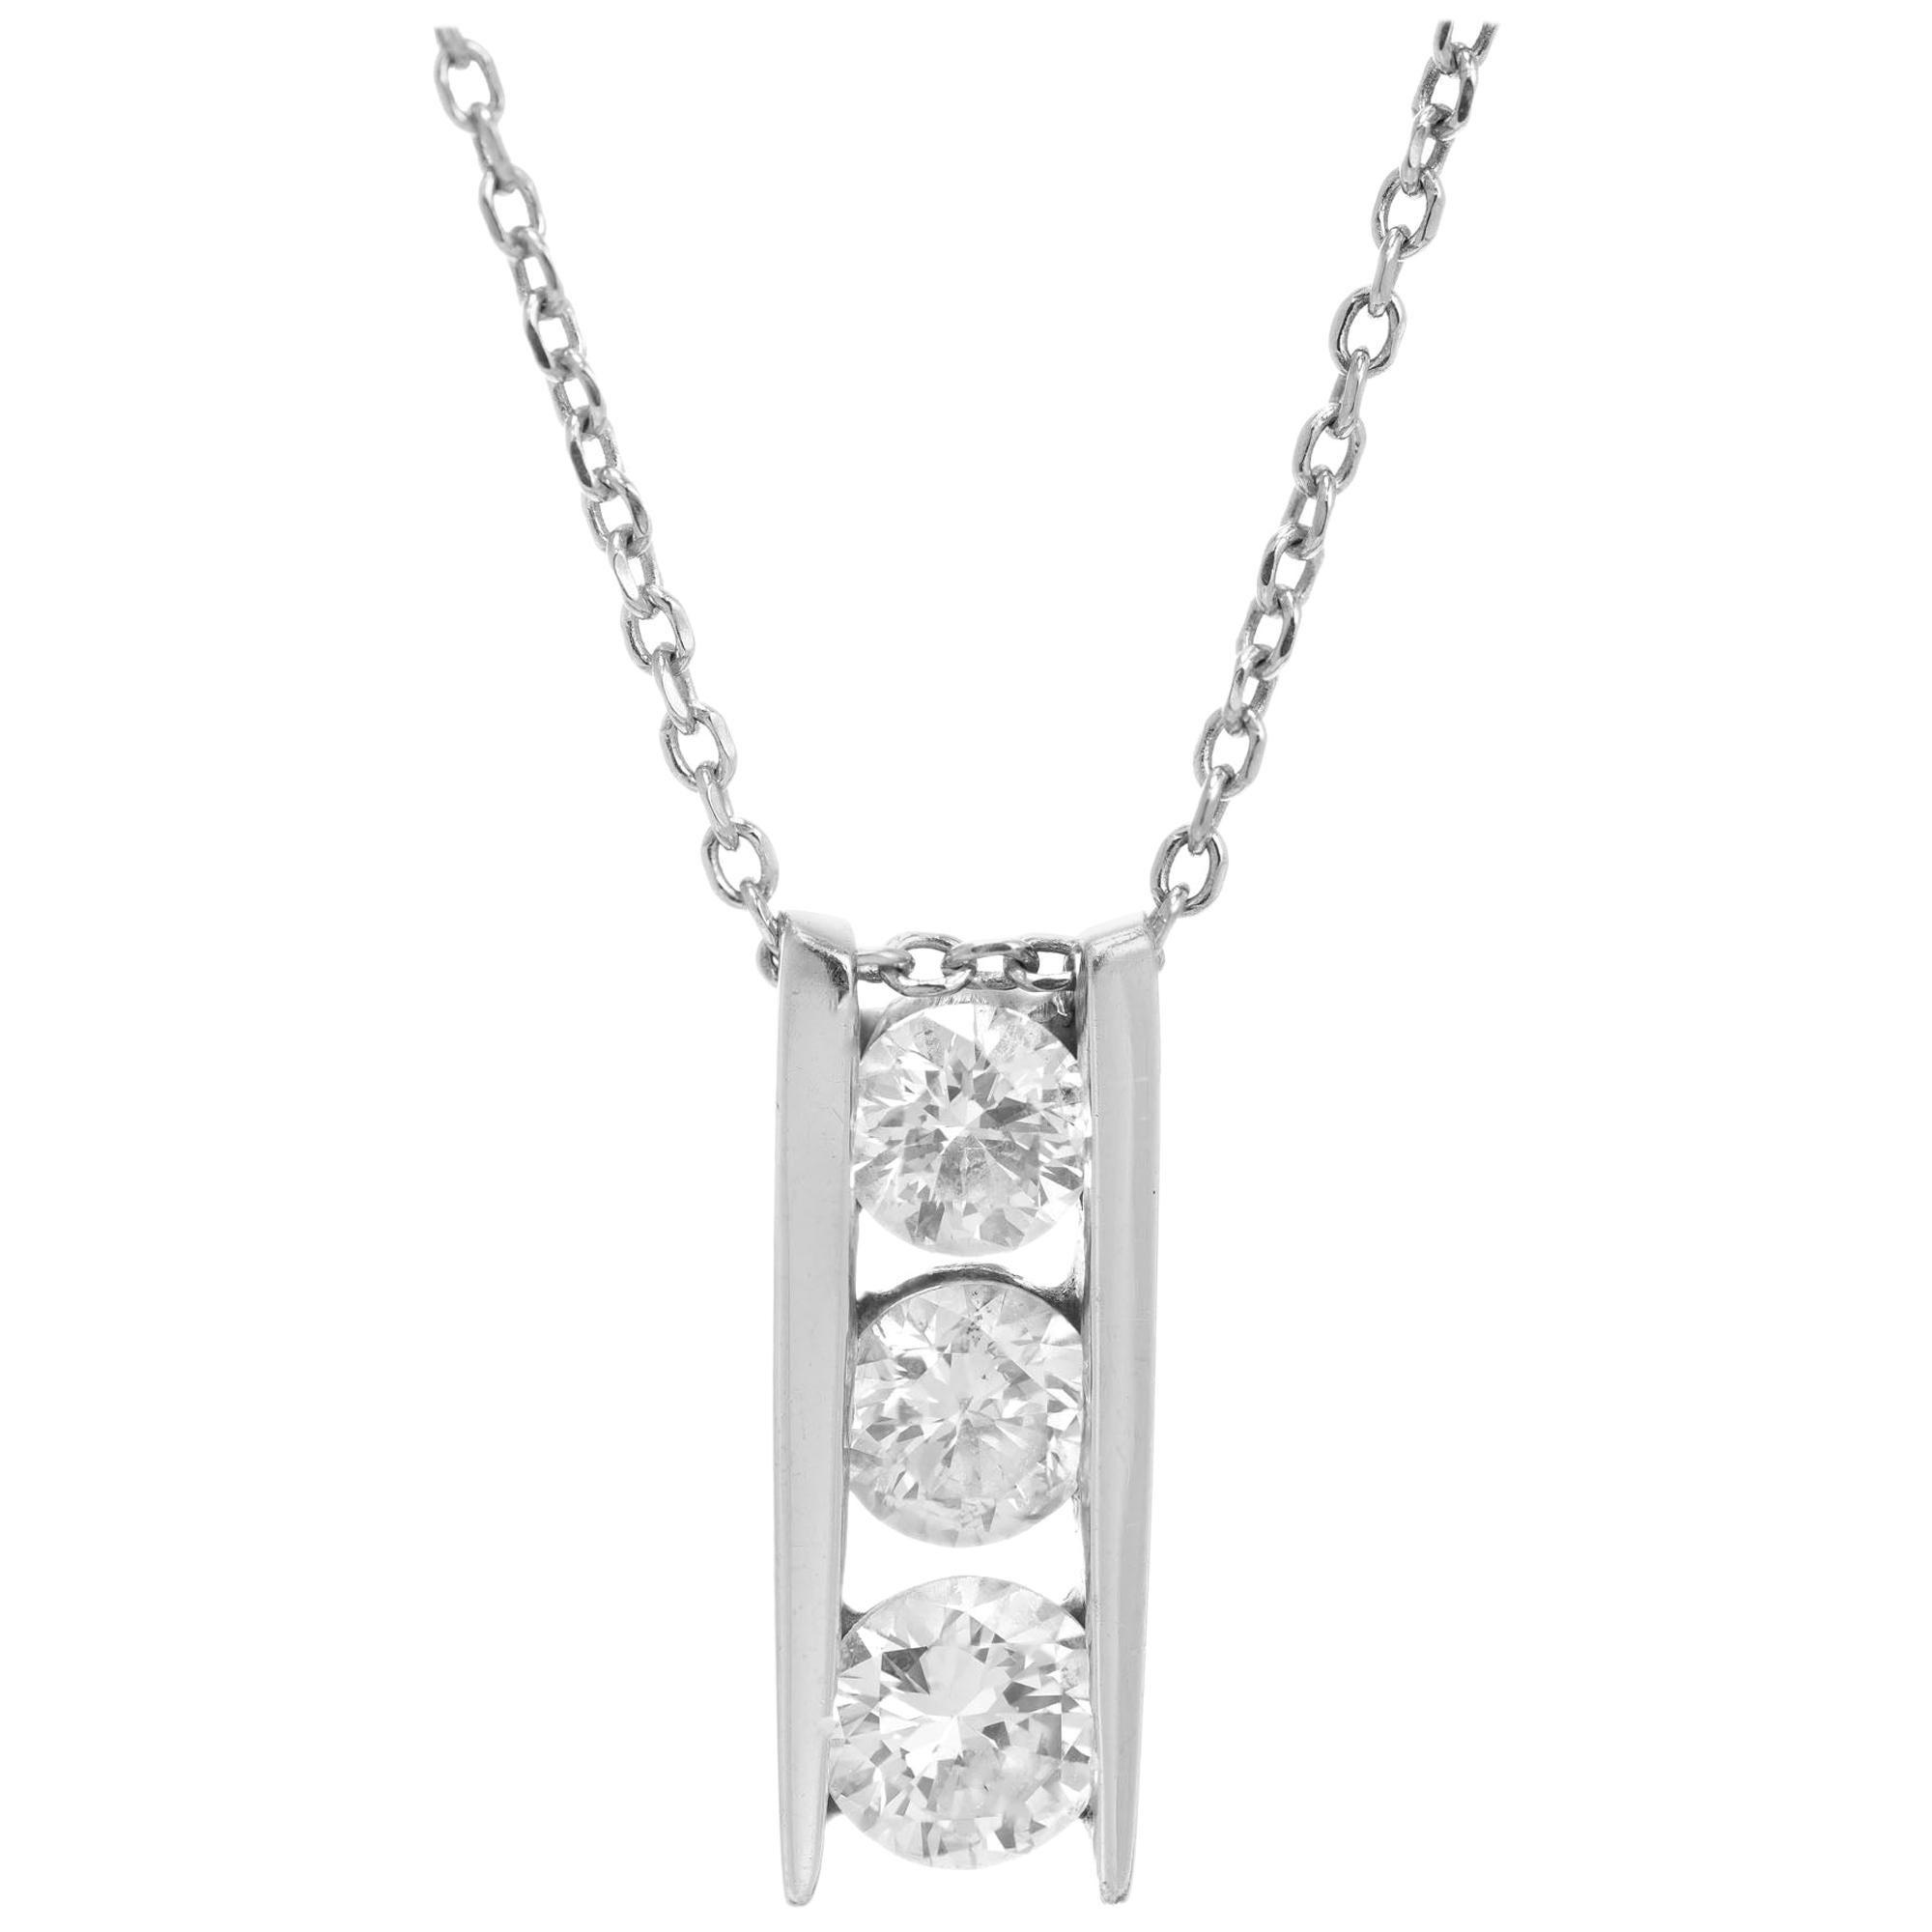 1.00 Carat Three Diamond White Gold Pendant Necklace